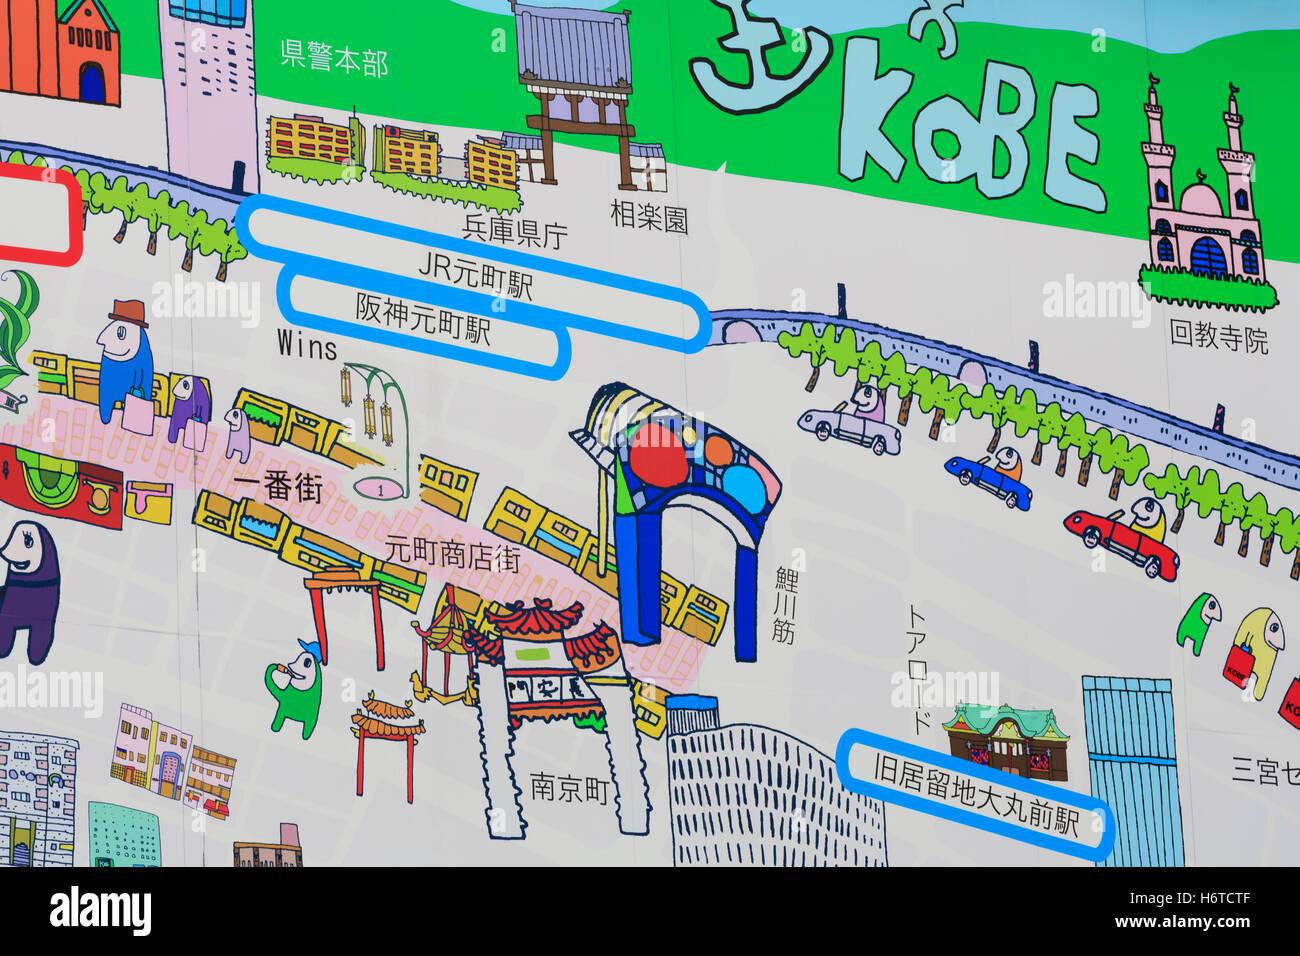 Map of Kobe City, Honshu Island, Japan, Asia - Stock Image